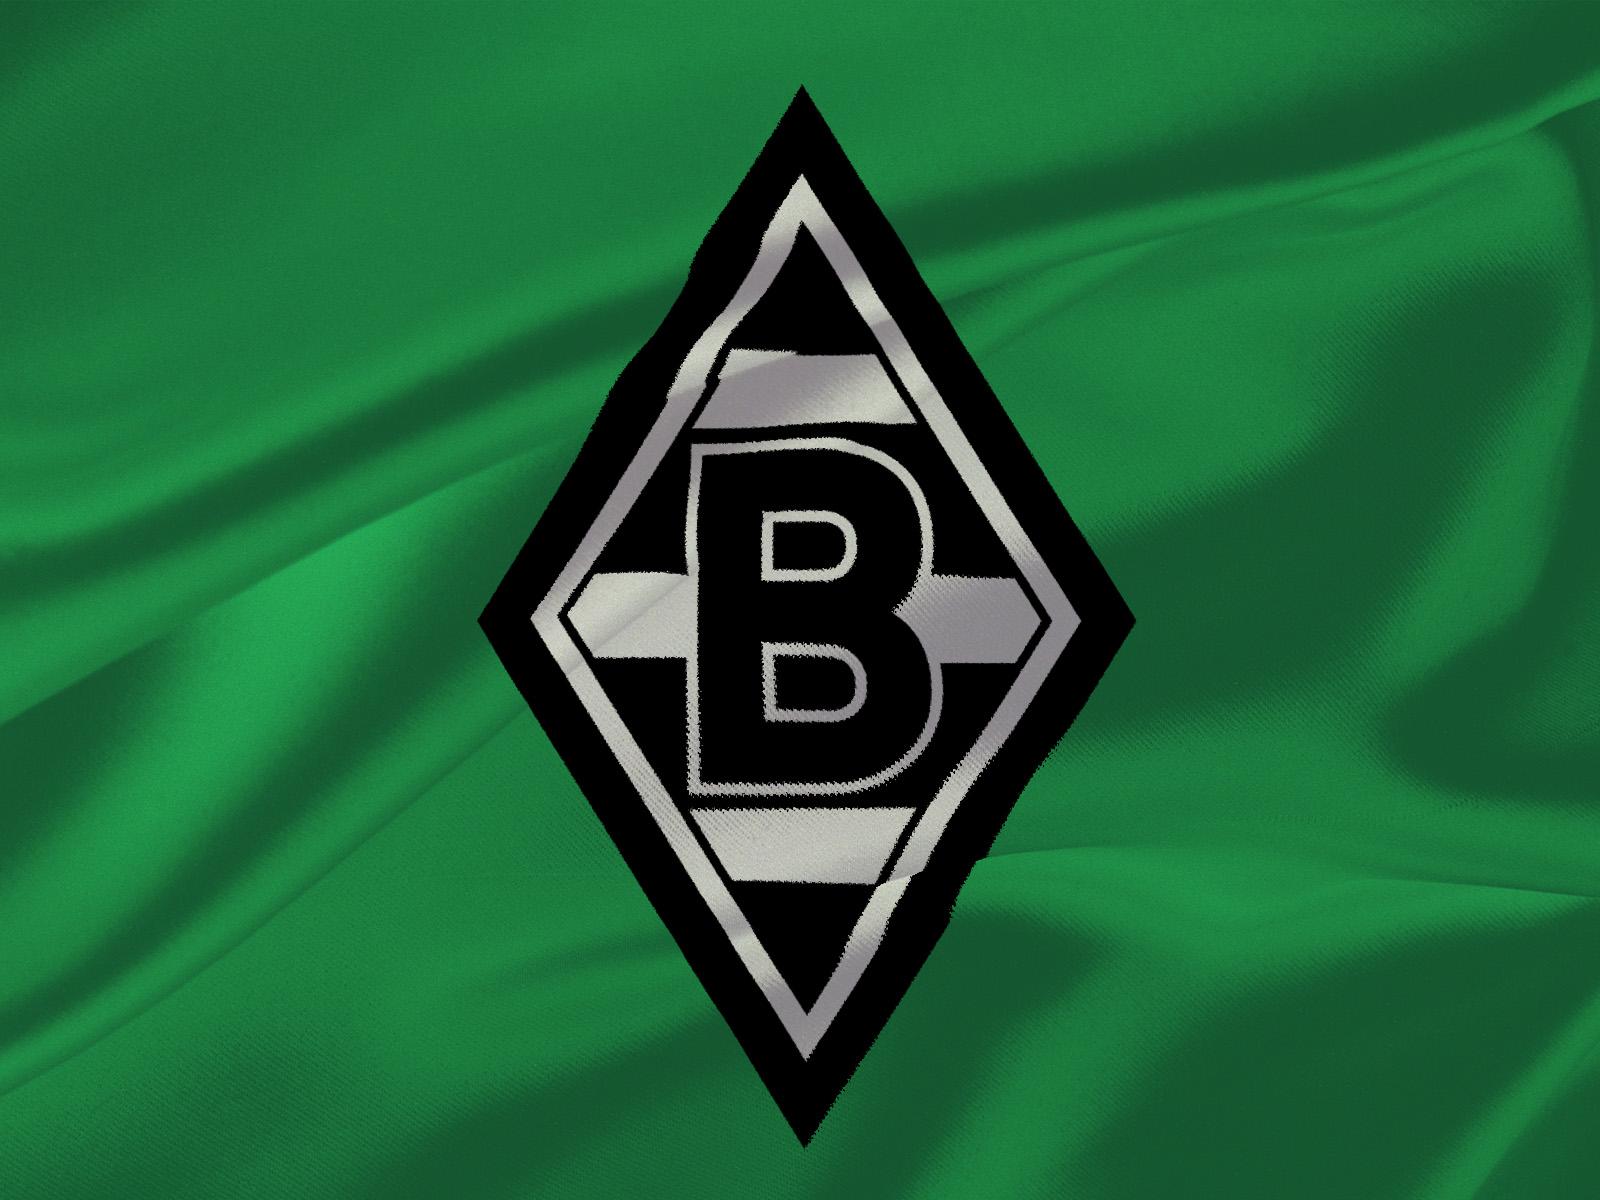 Borussia Mönchengladba